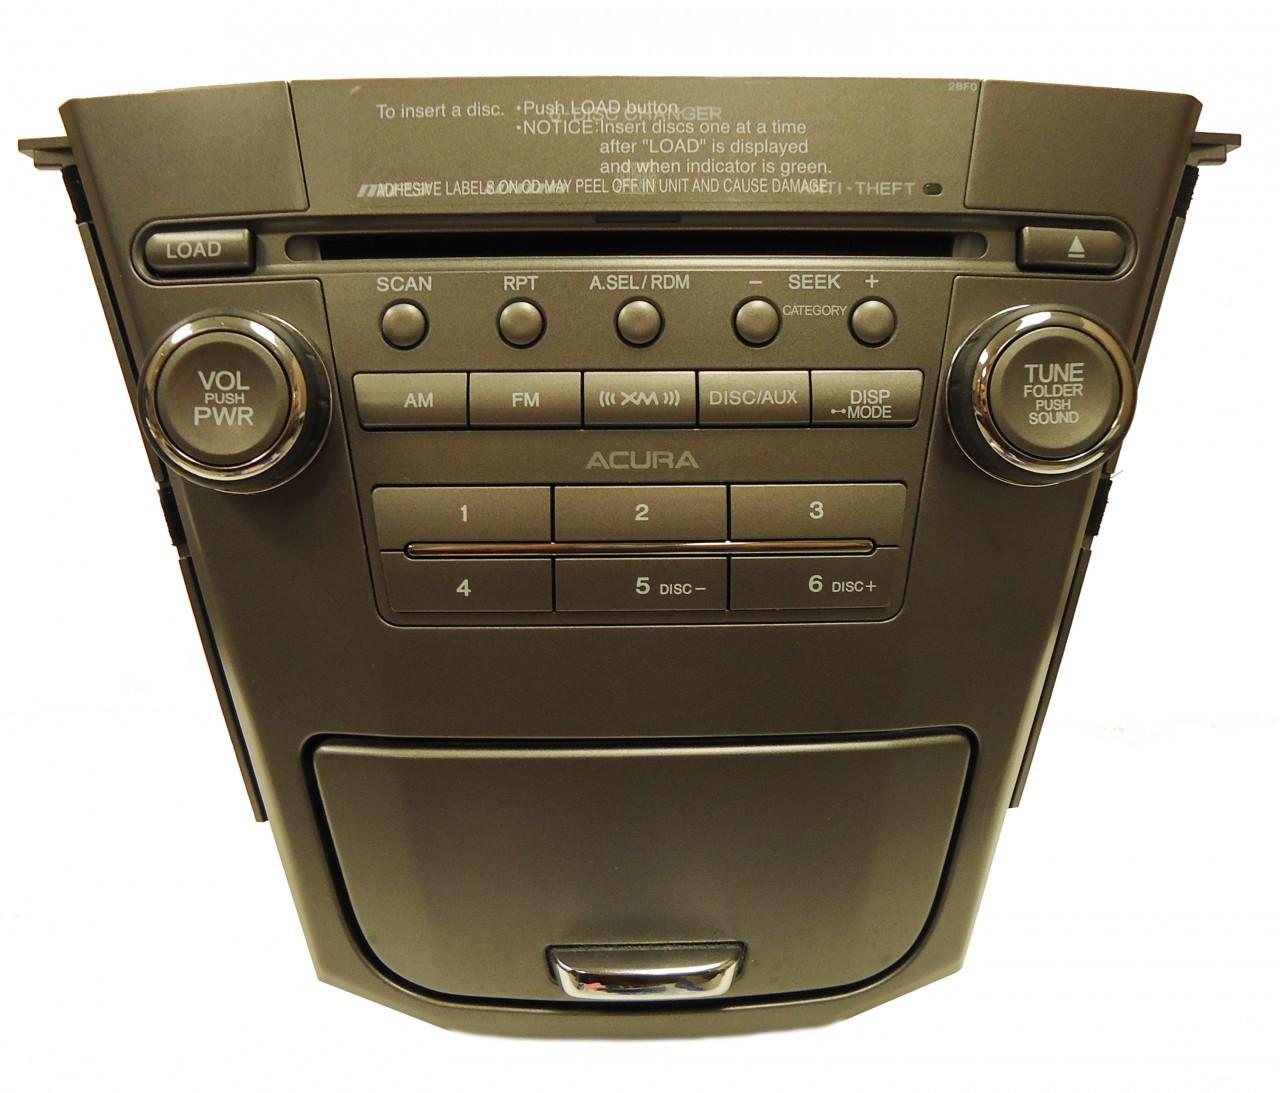 07 08 09 ACURA MDX Radio Stereo 6 MP3 CD Changer Disc